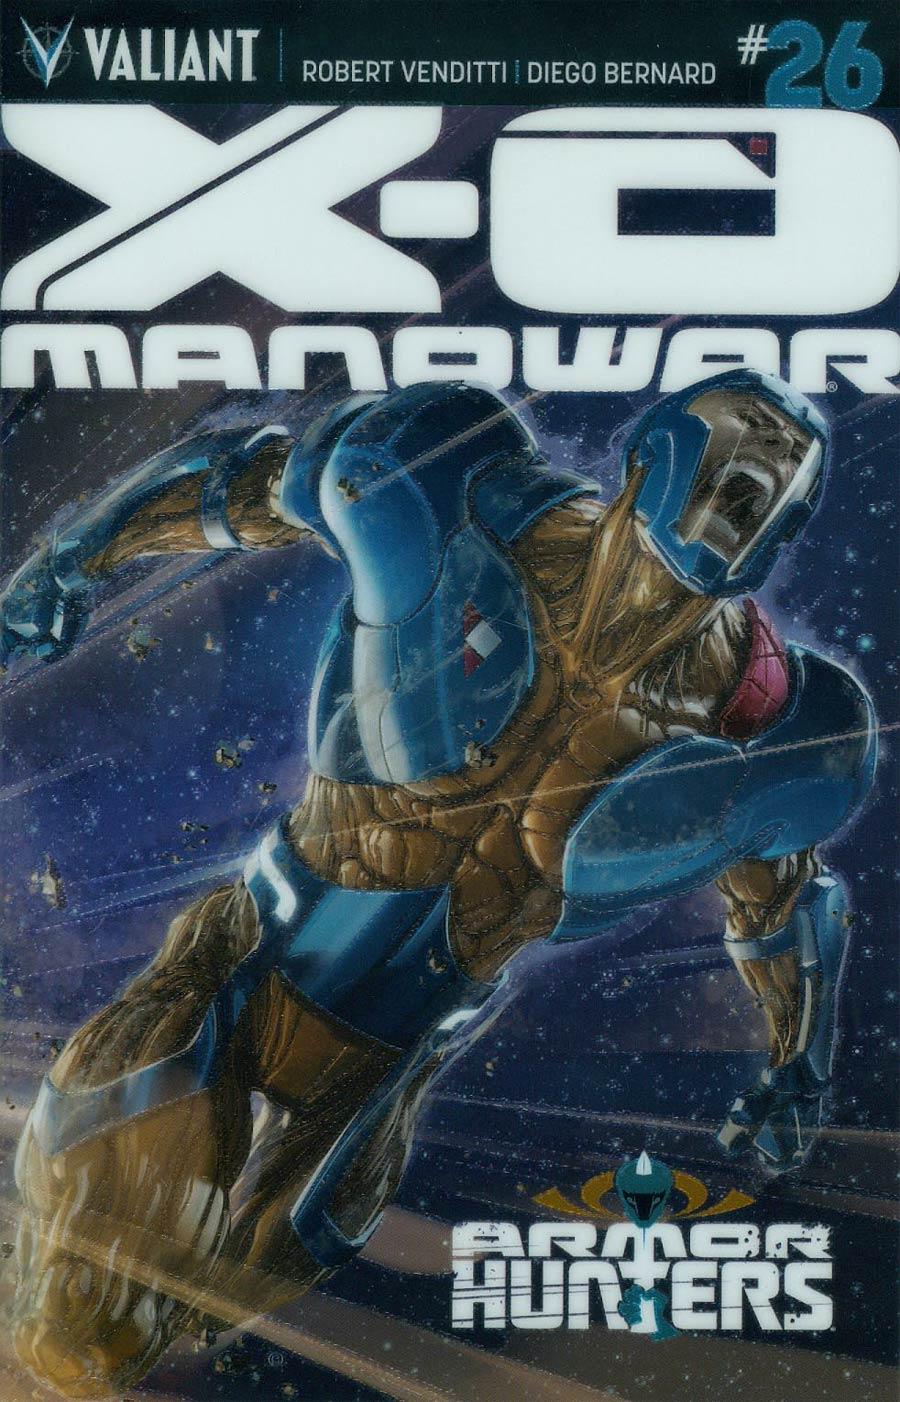 X-O Manowar Vol 3 #26 Cover C Variant Clayron Crain Chromium Cover (Armor Hunters Tie-In)